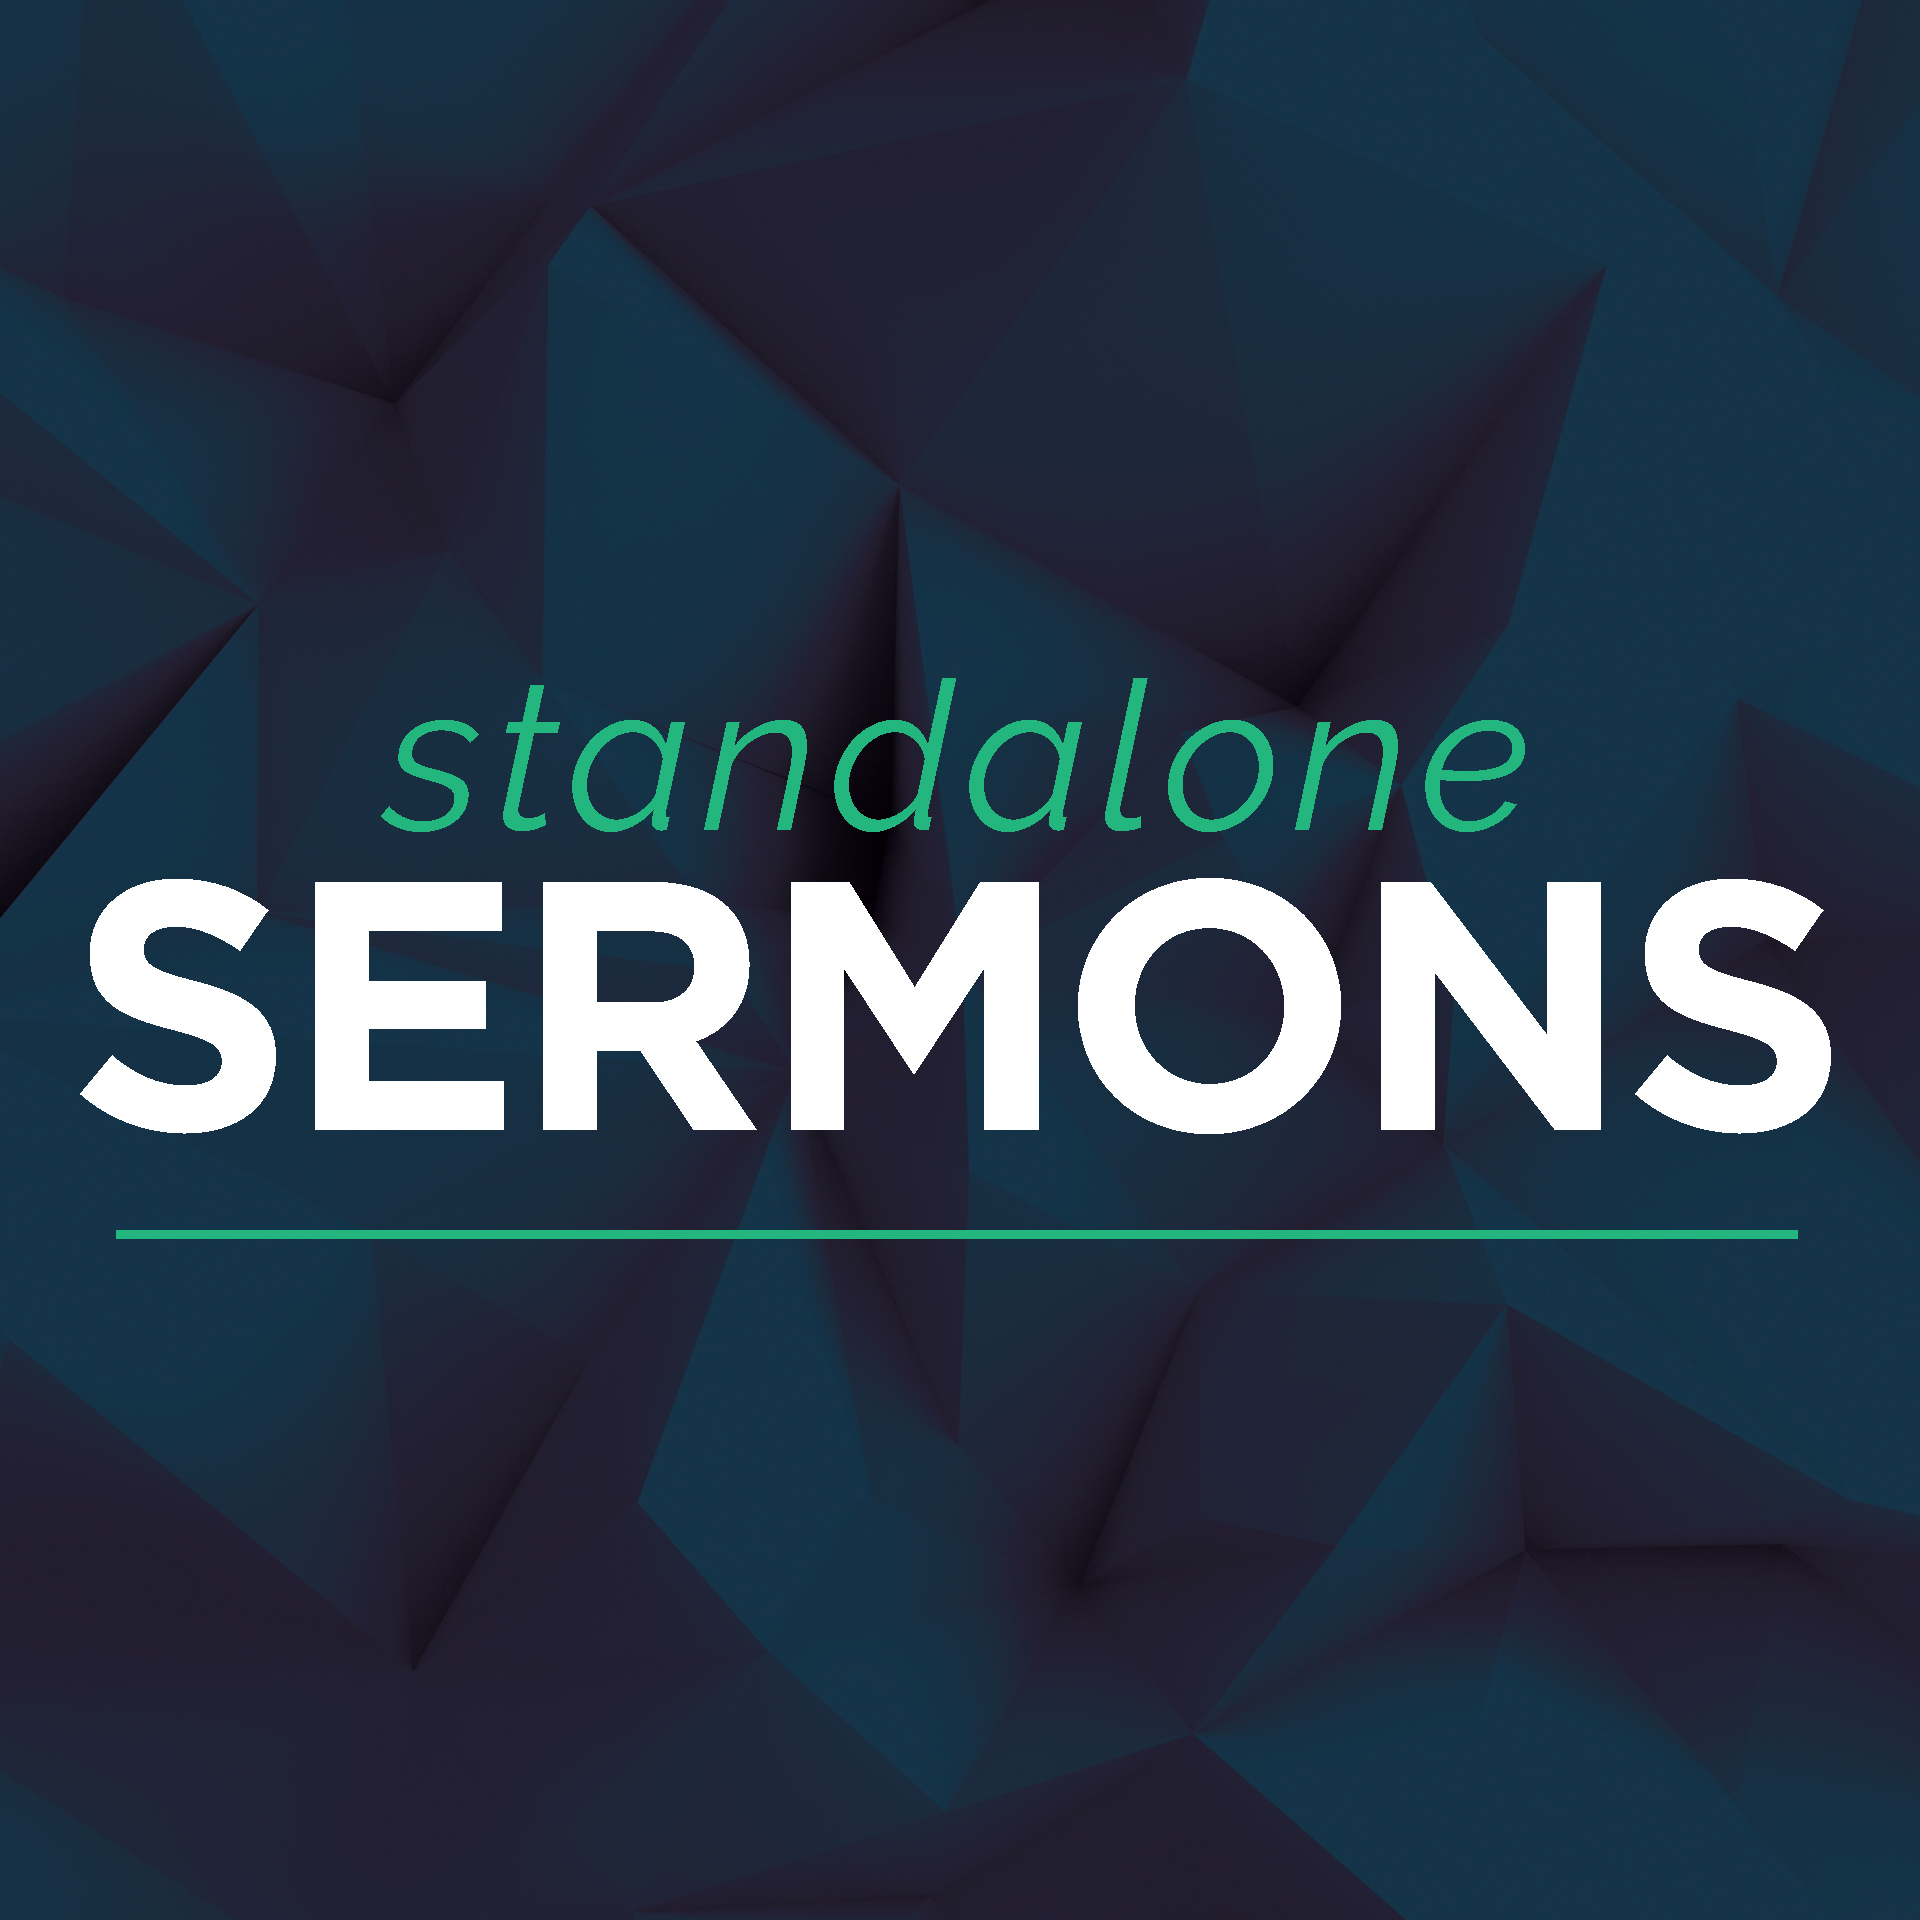 sm_standalone_sermons.jpg